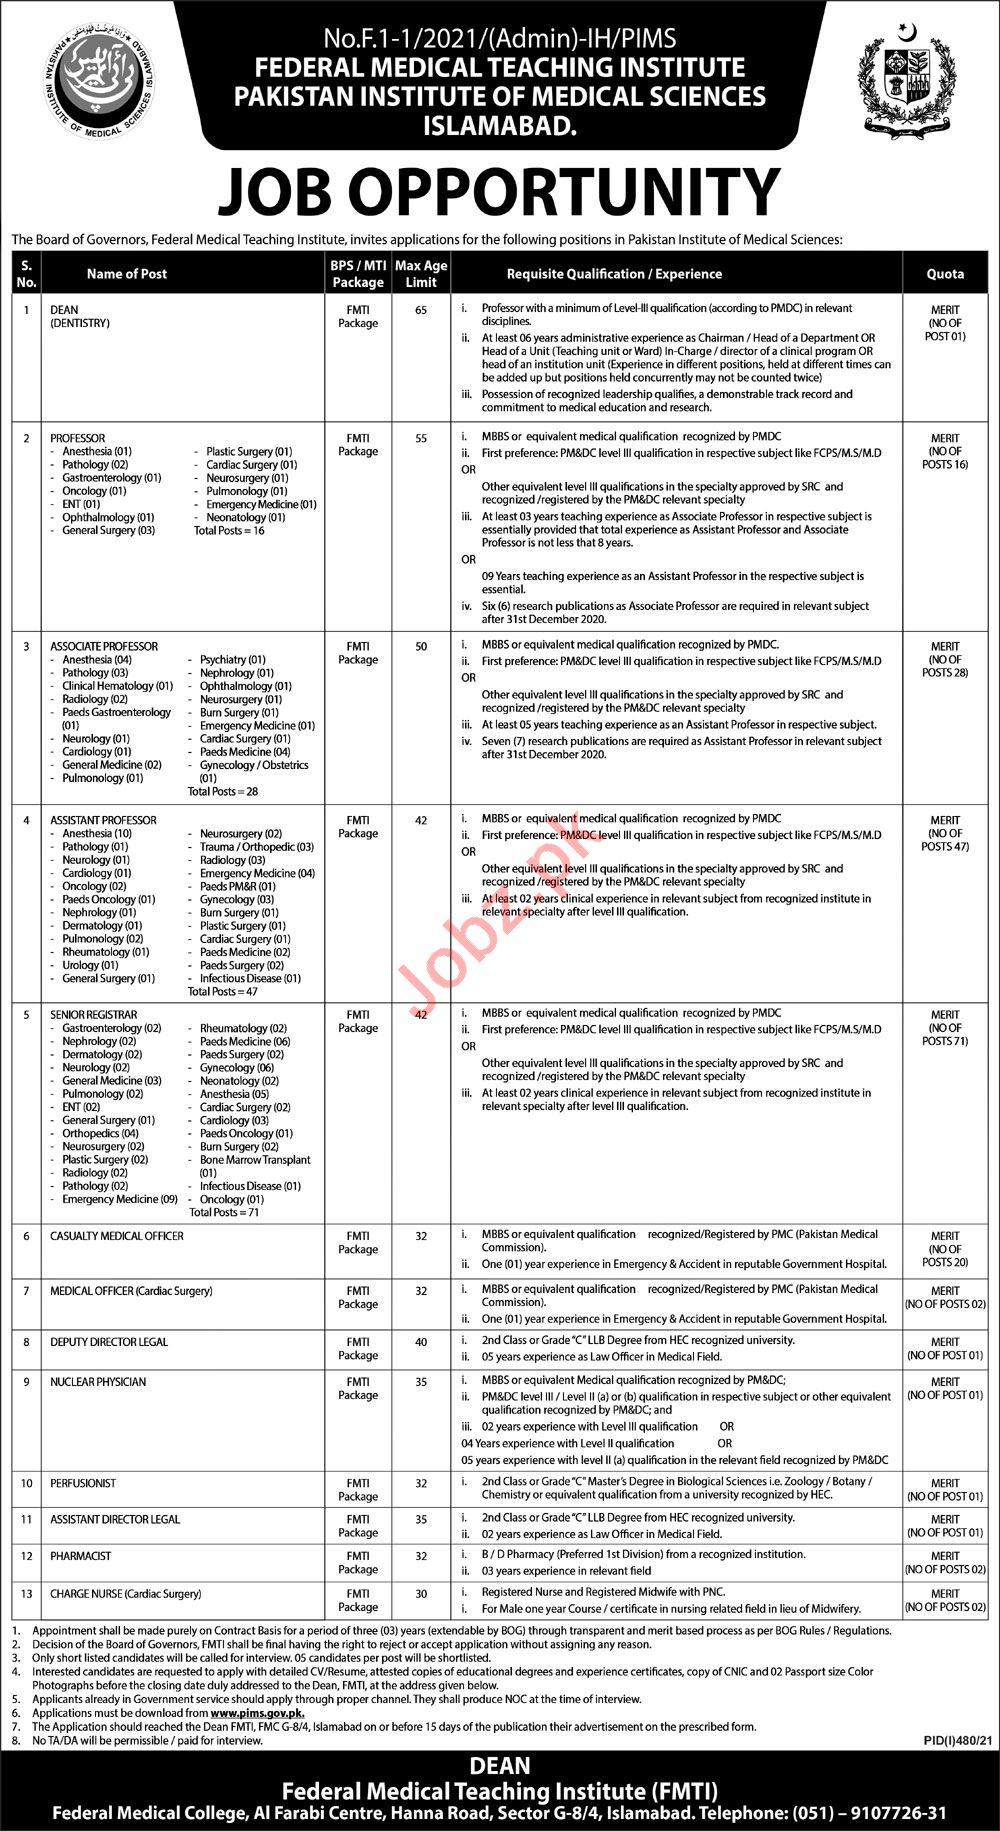 Federal Medical Teaching Institute FMTI Islamabad Jobs 2021